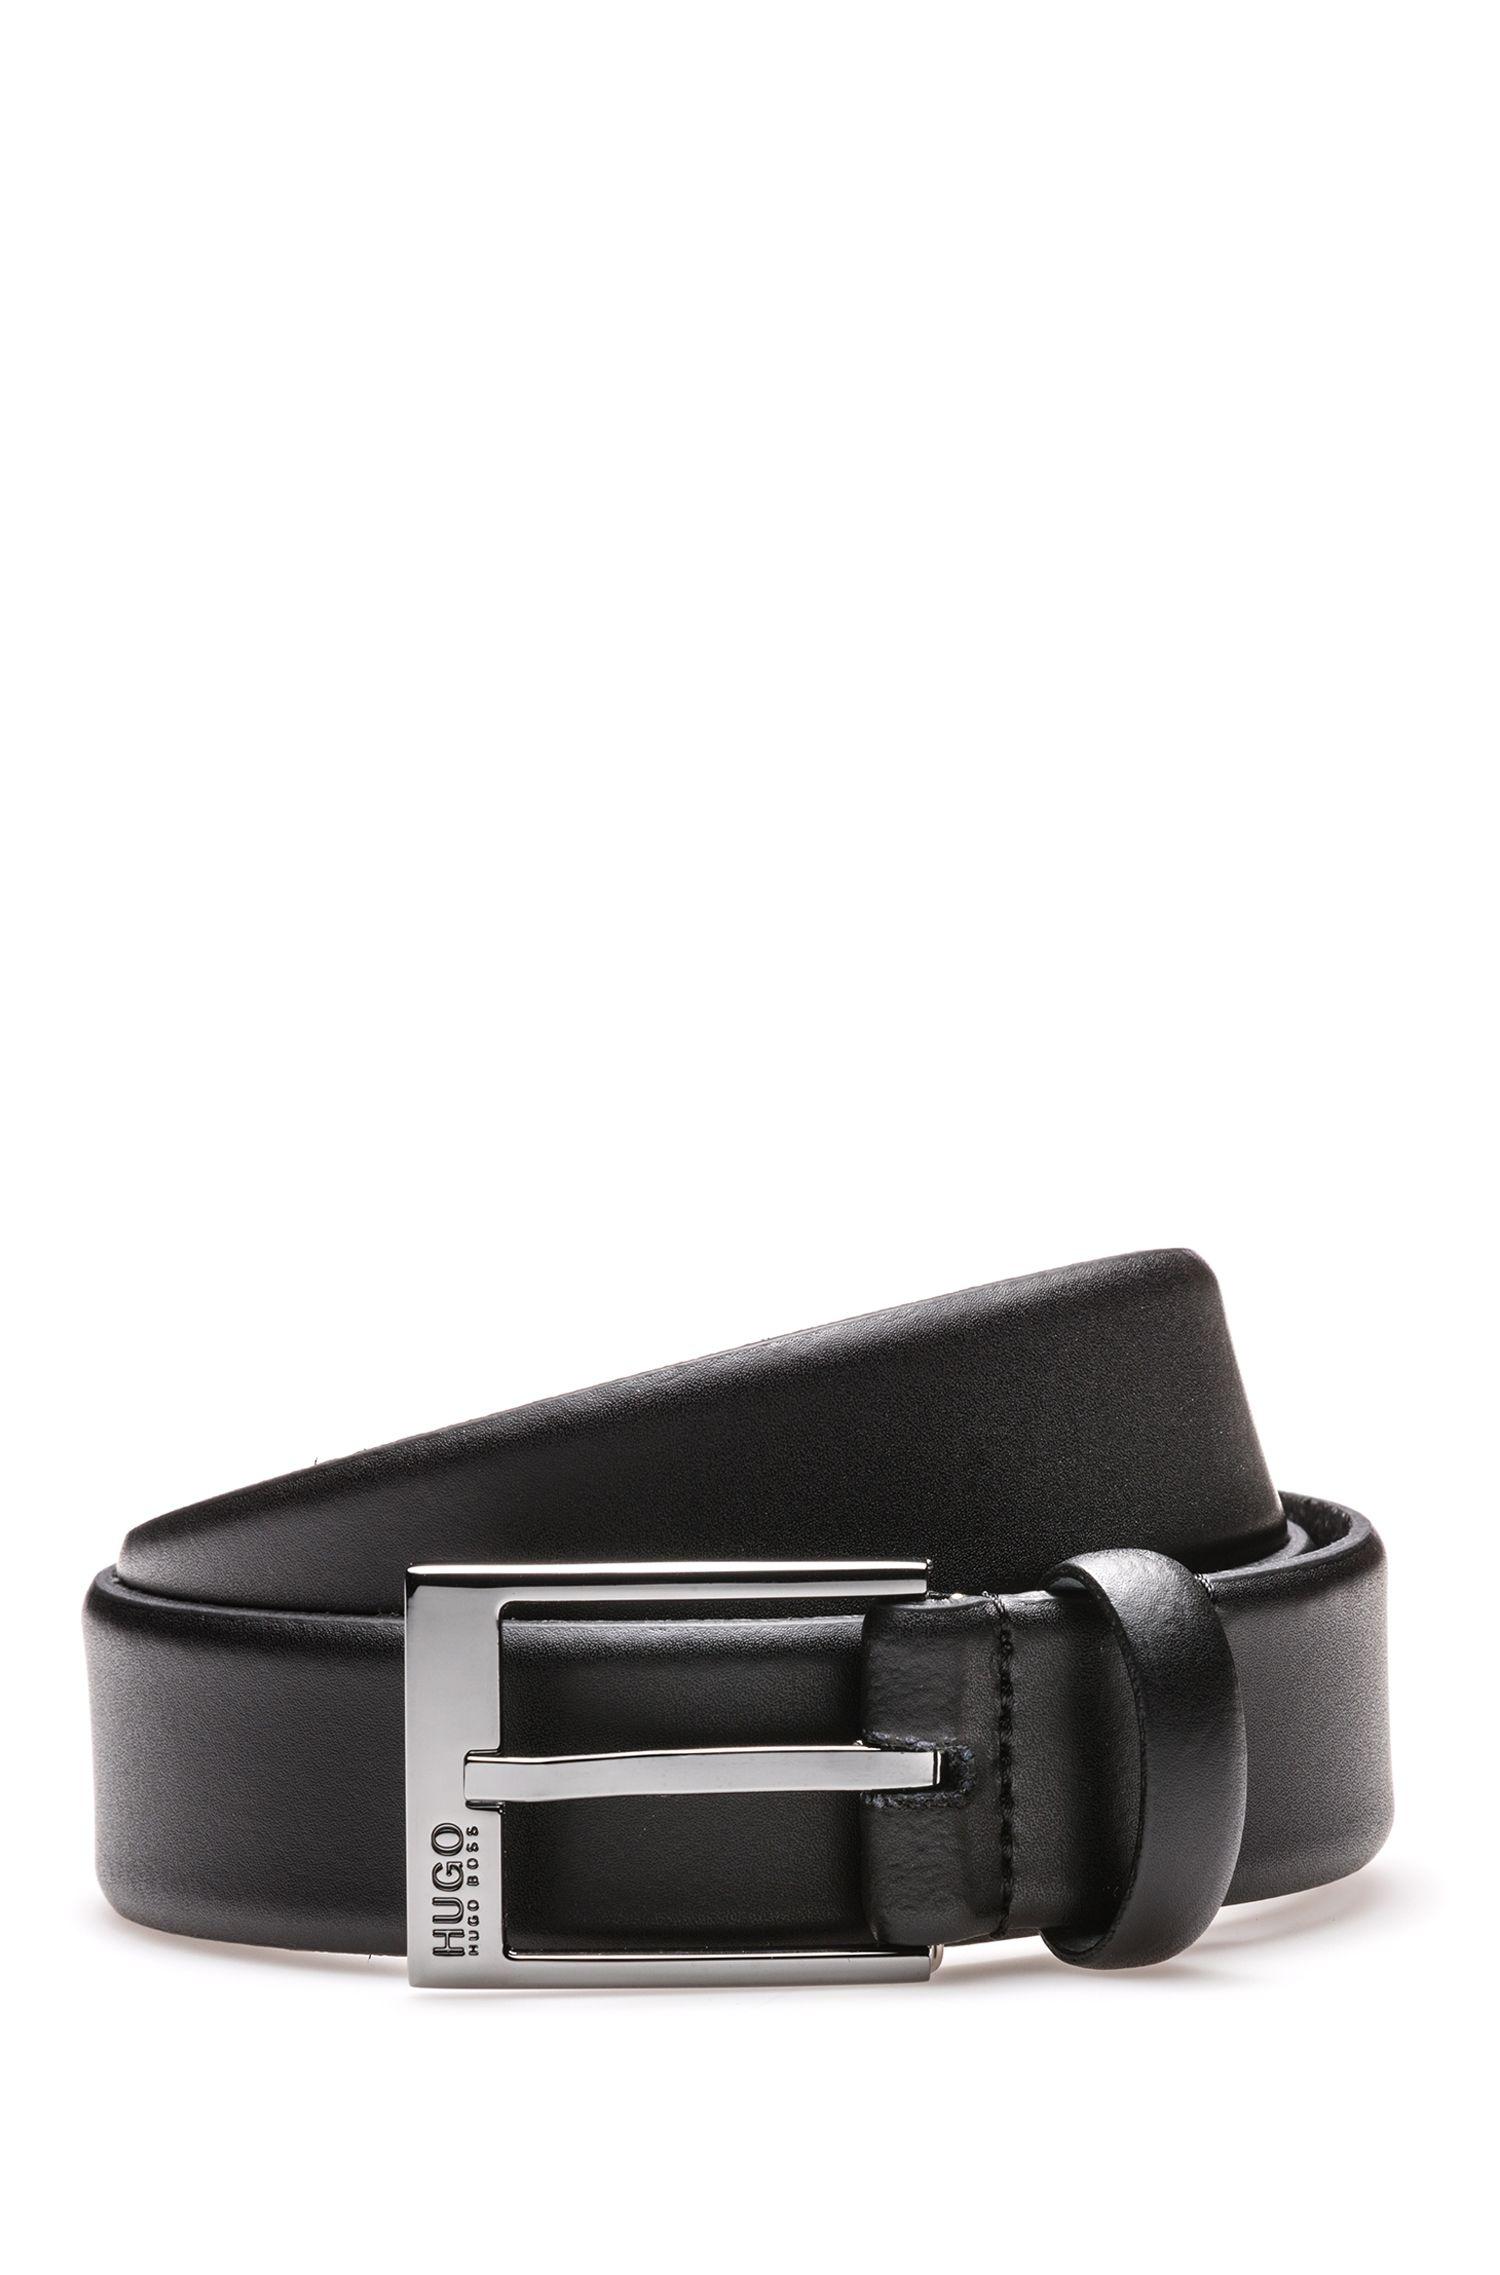 Matt-leather belt with polished gunmetal hardware